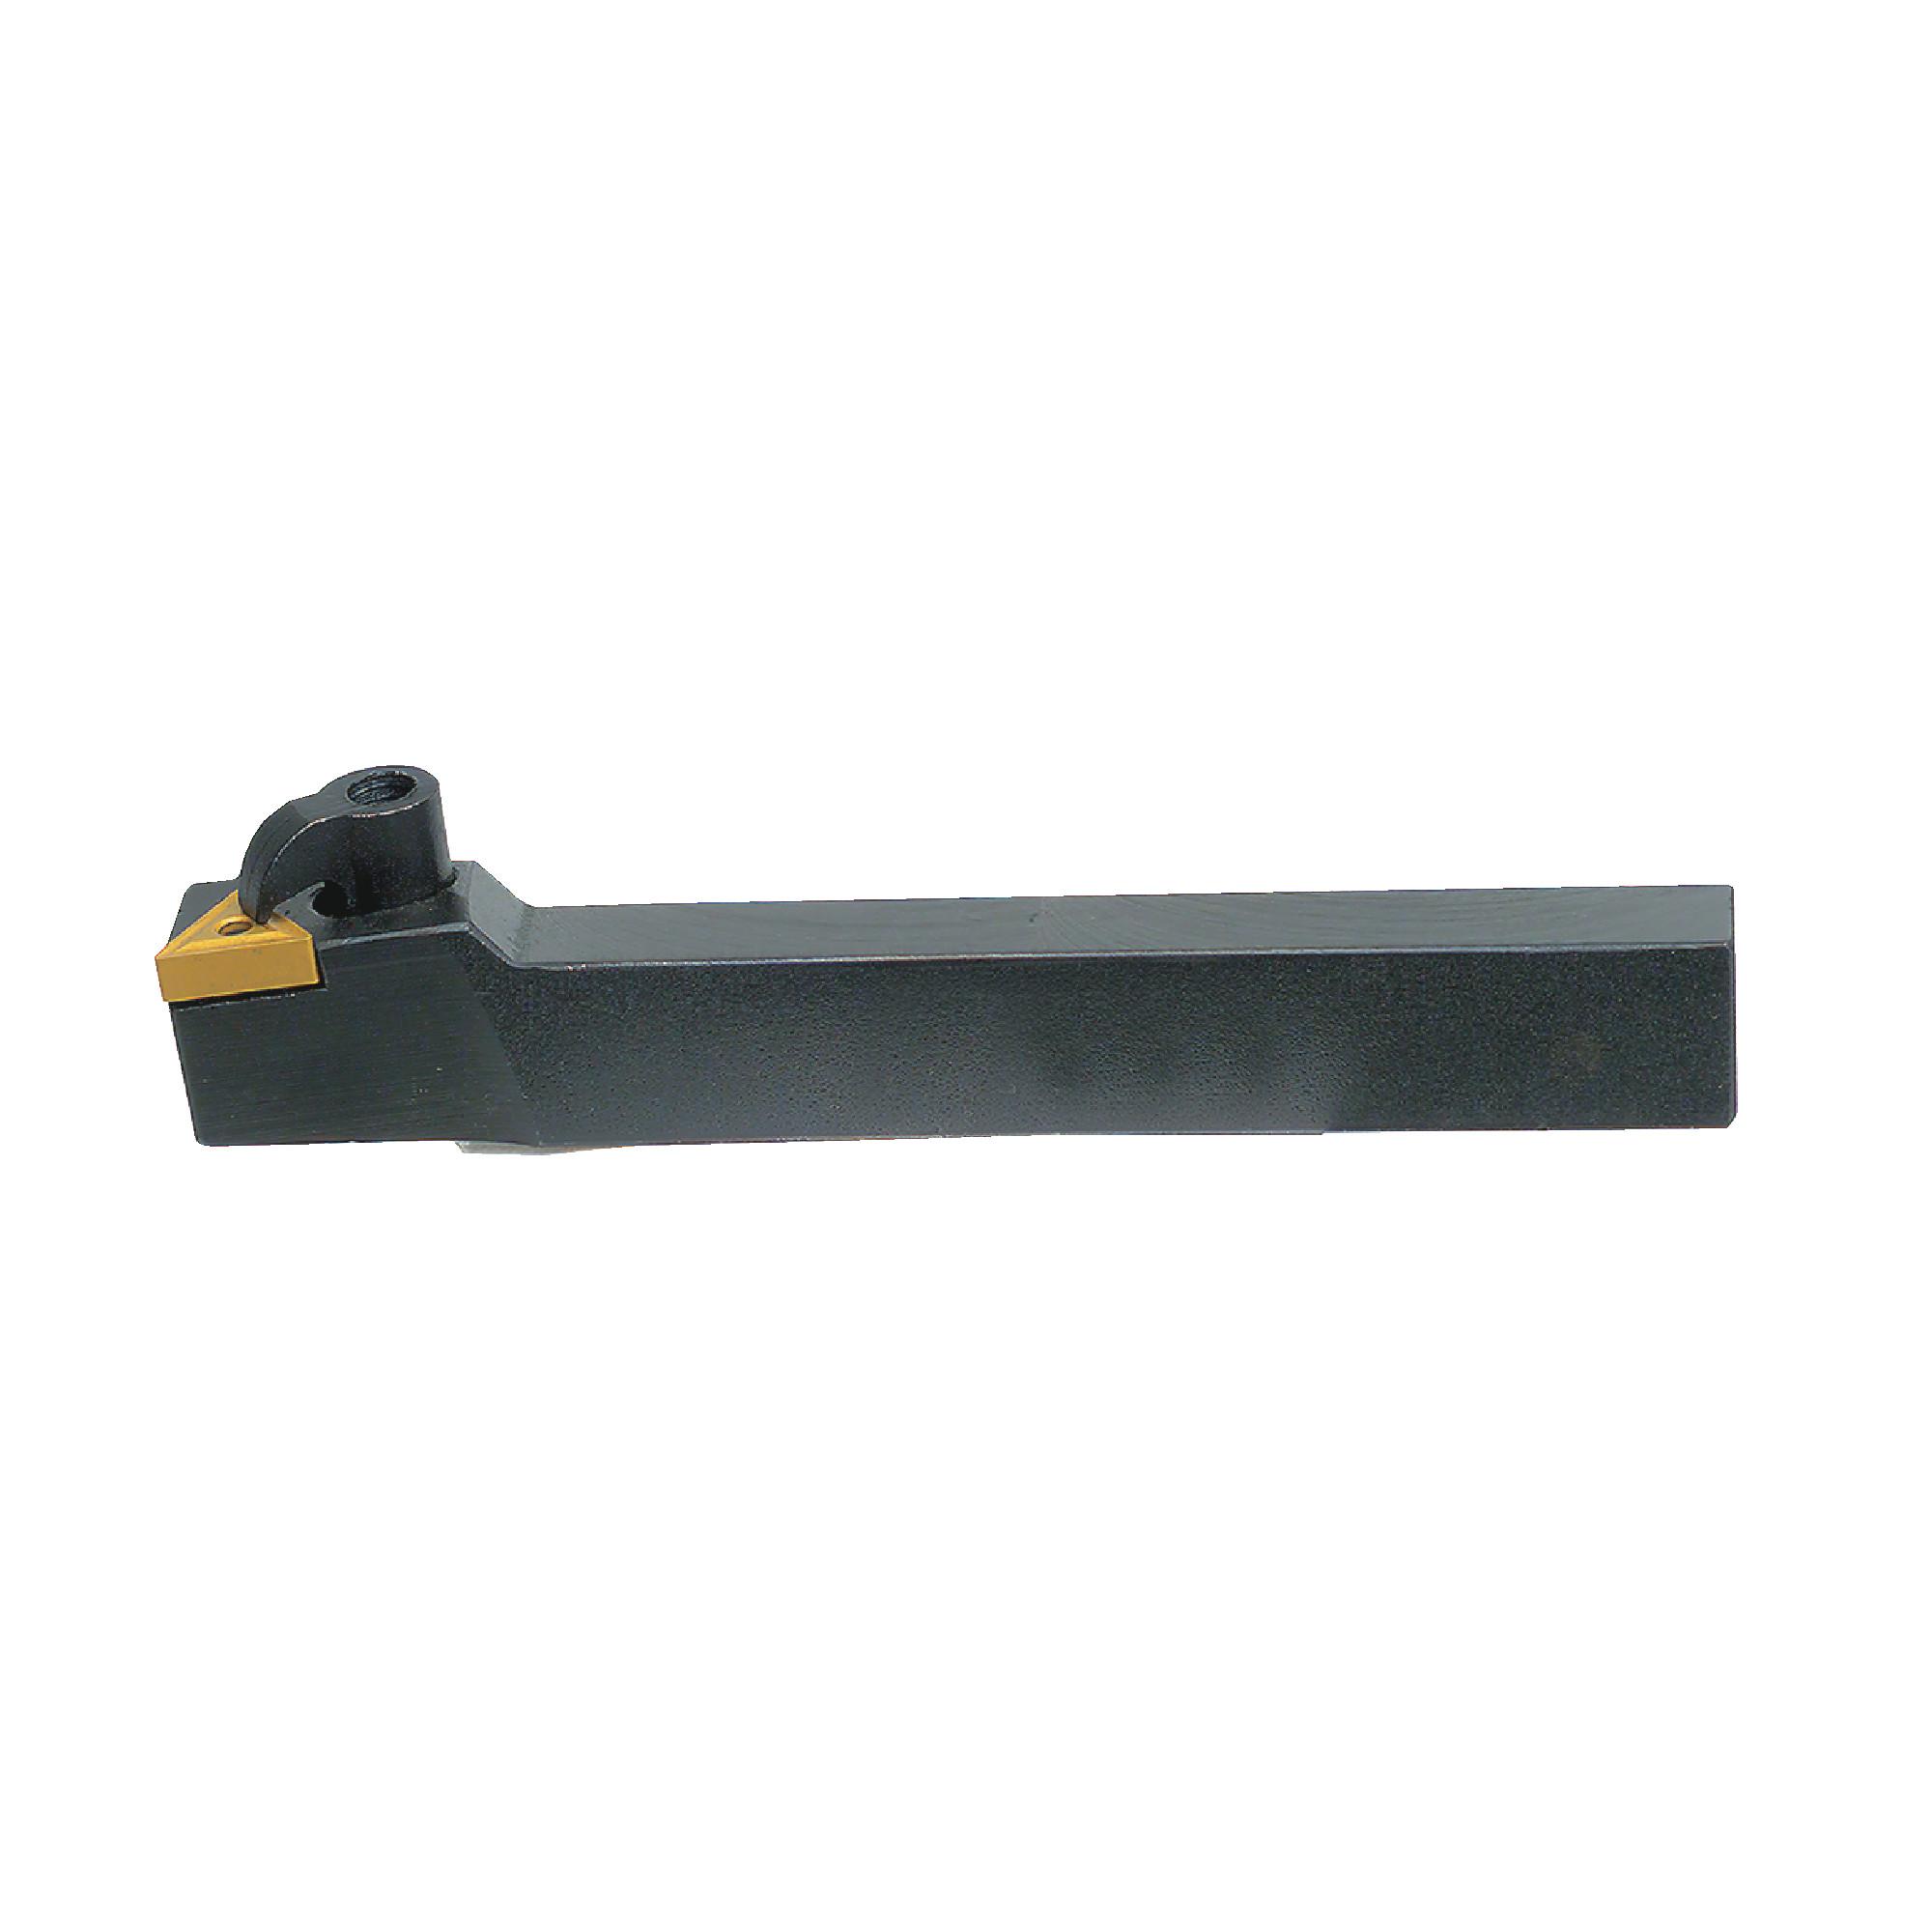 "DORIAN - CTAPR08-2J / 0.500"" Tool Holder for TPG22_  Inserts / Right Hand"